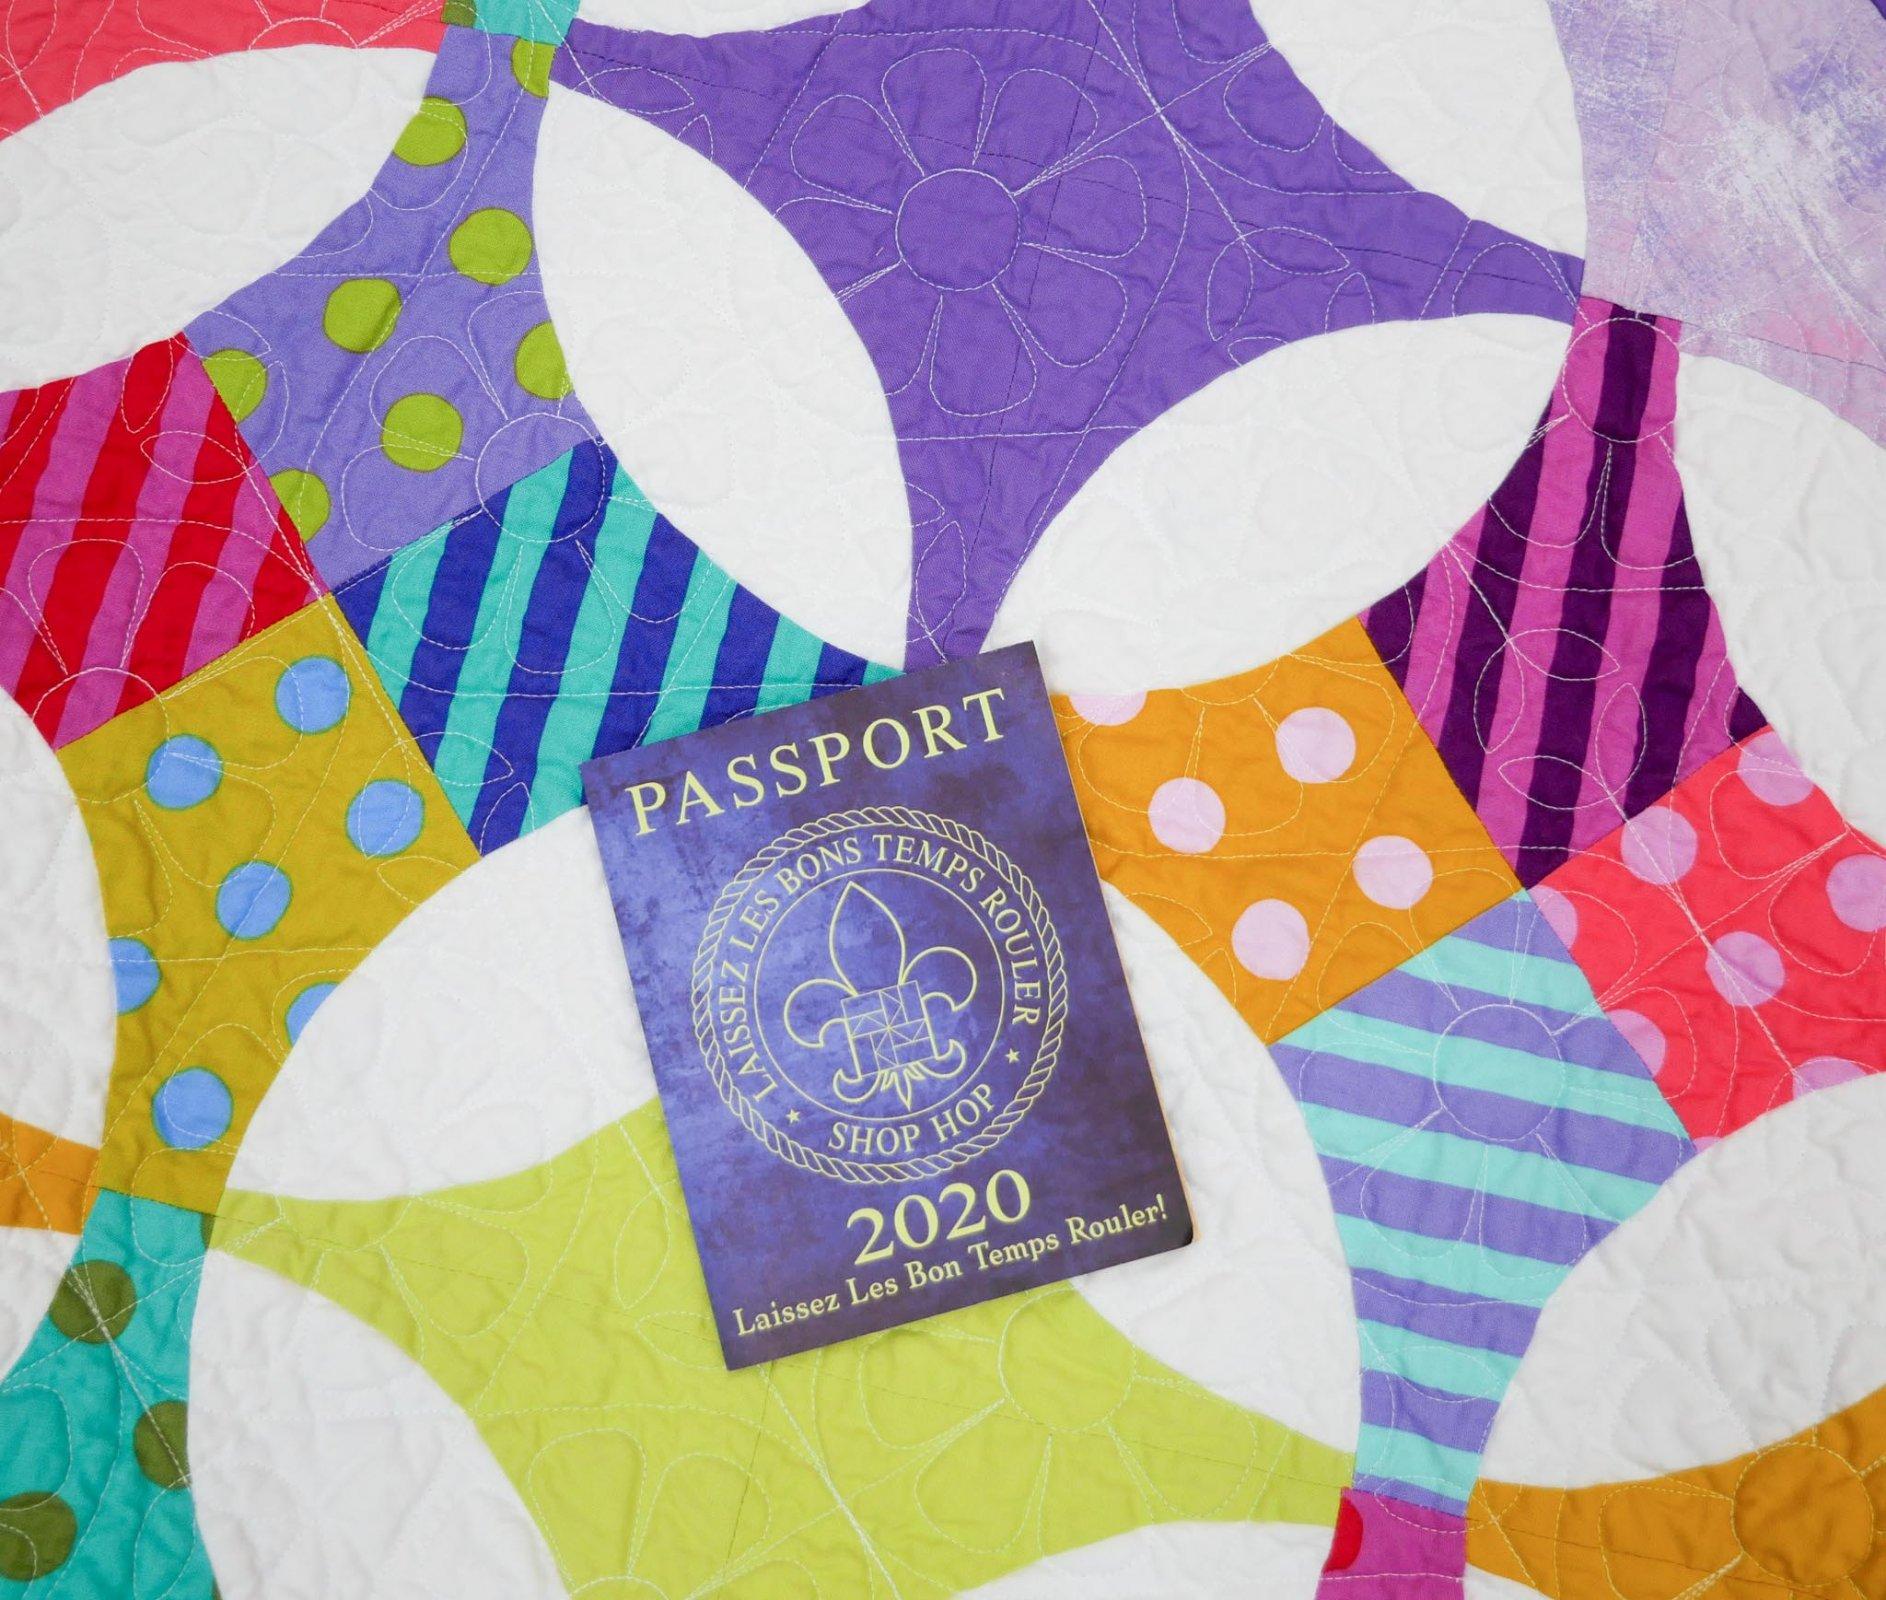 Passport - Shop Hop 2020